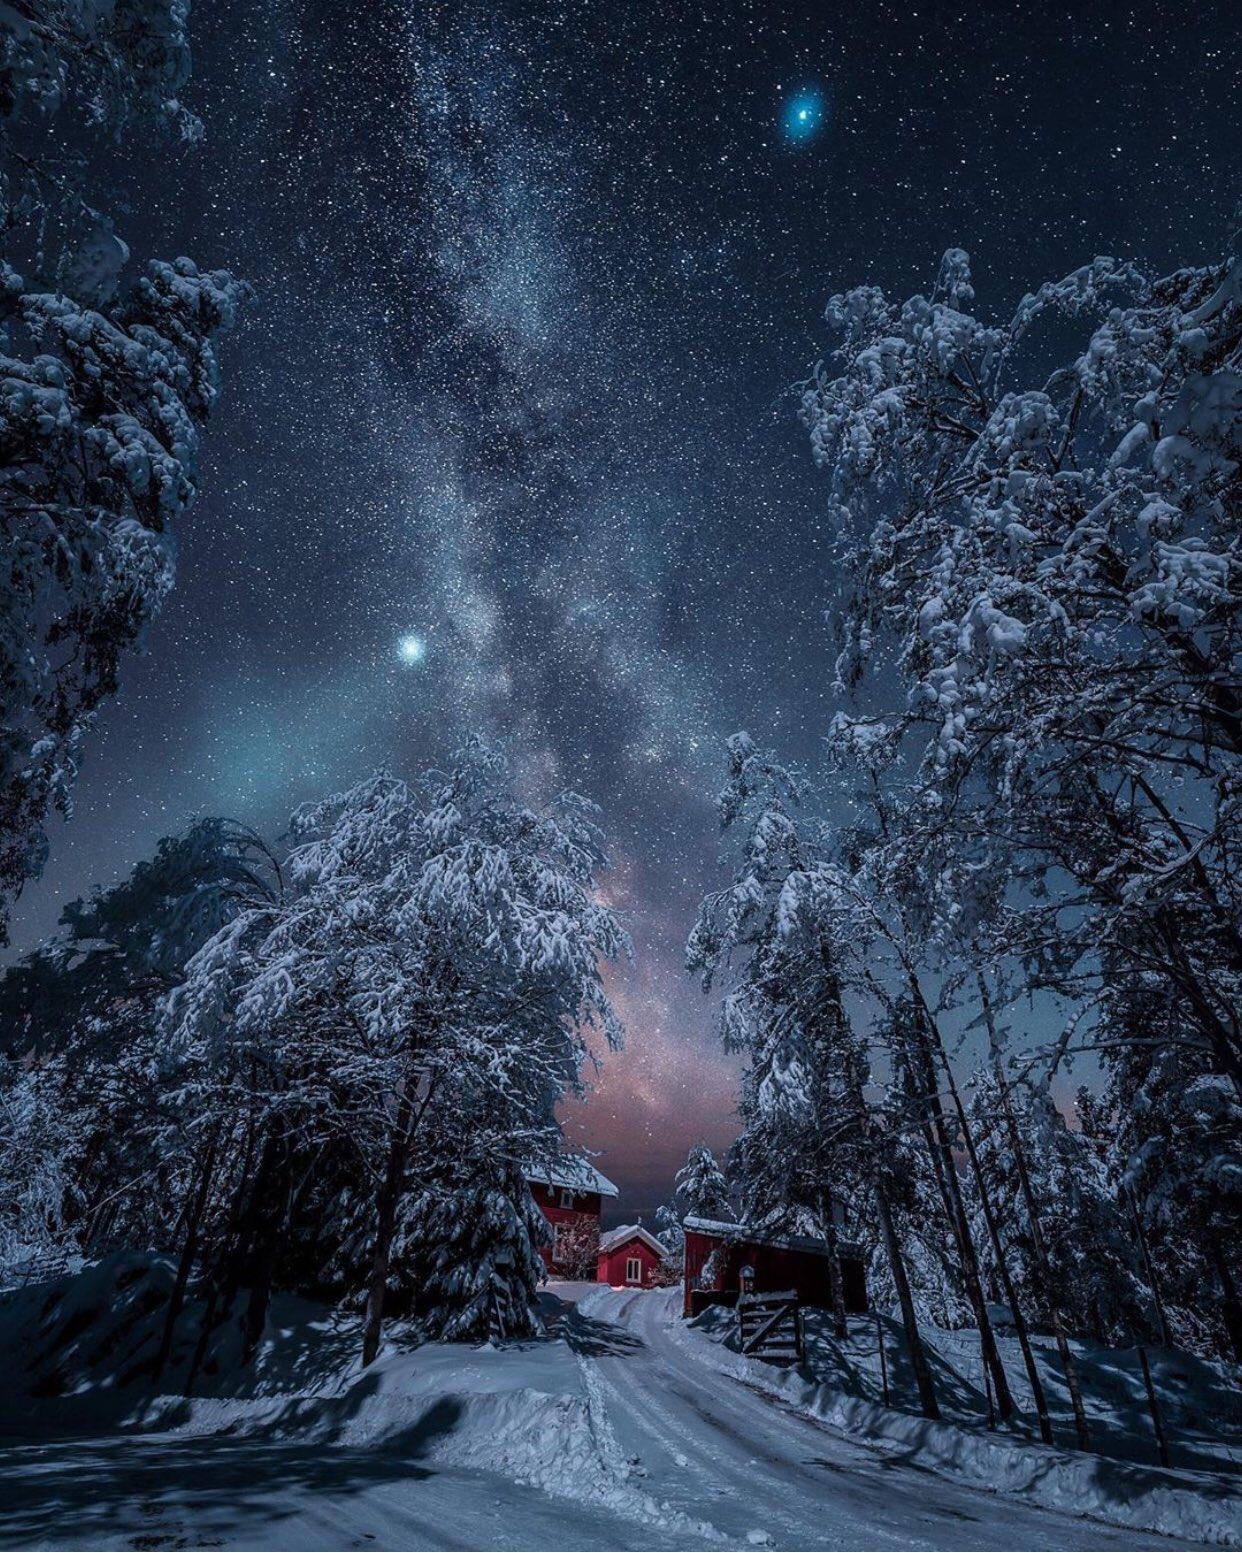 Good night   Kongsberg Norway  By Sondre Eriksen https://t.co/70rq3pVeEc